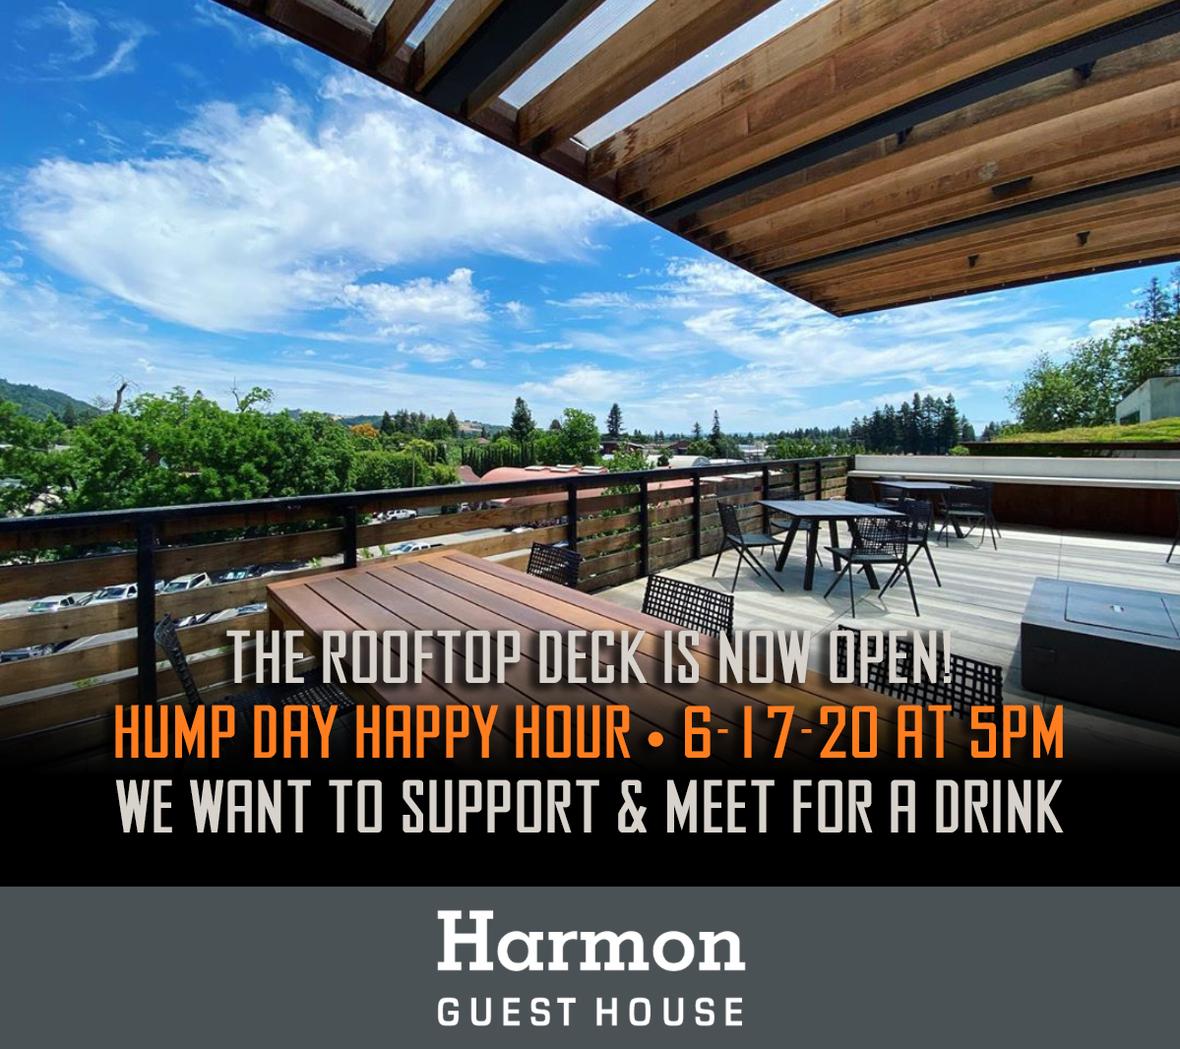 harmon roof open